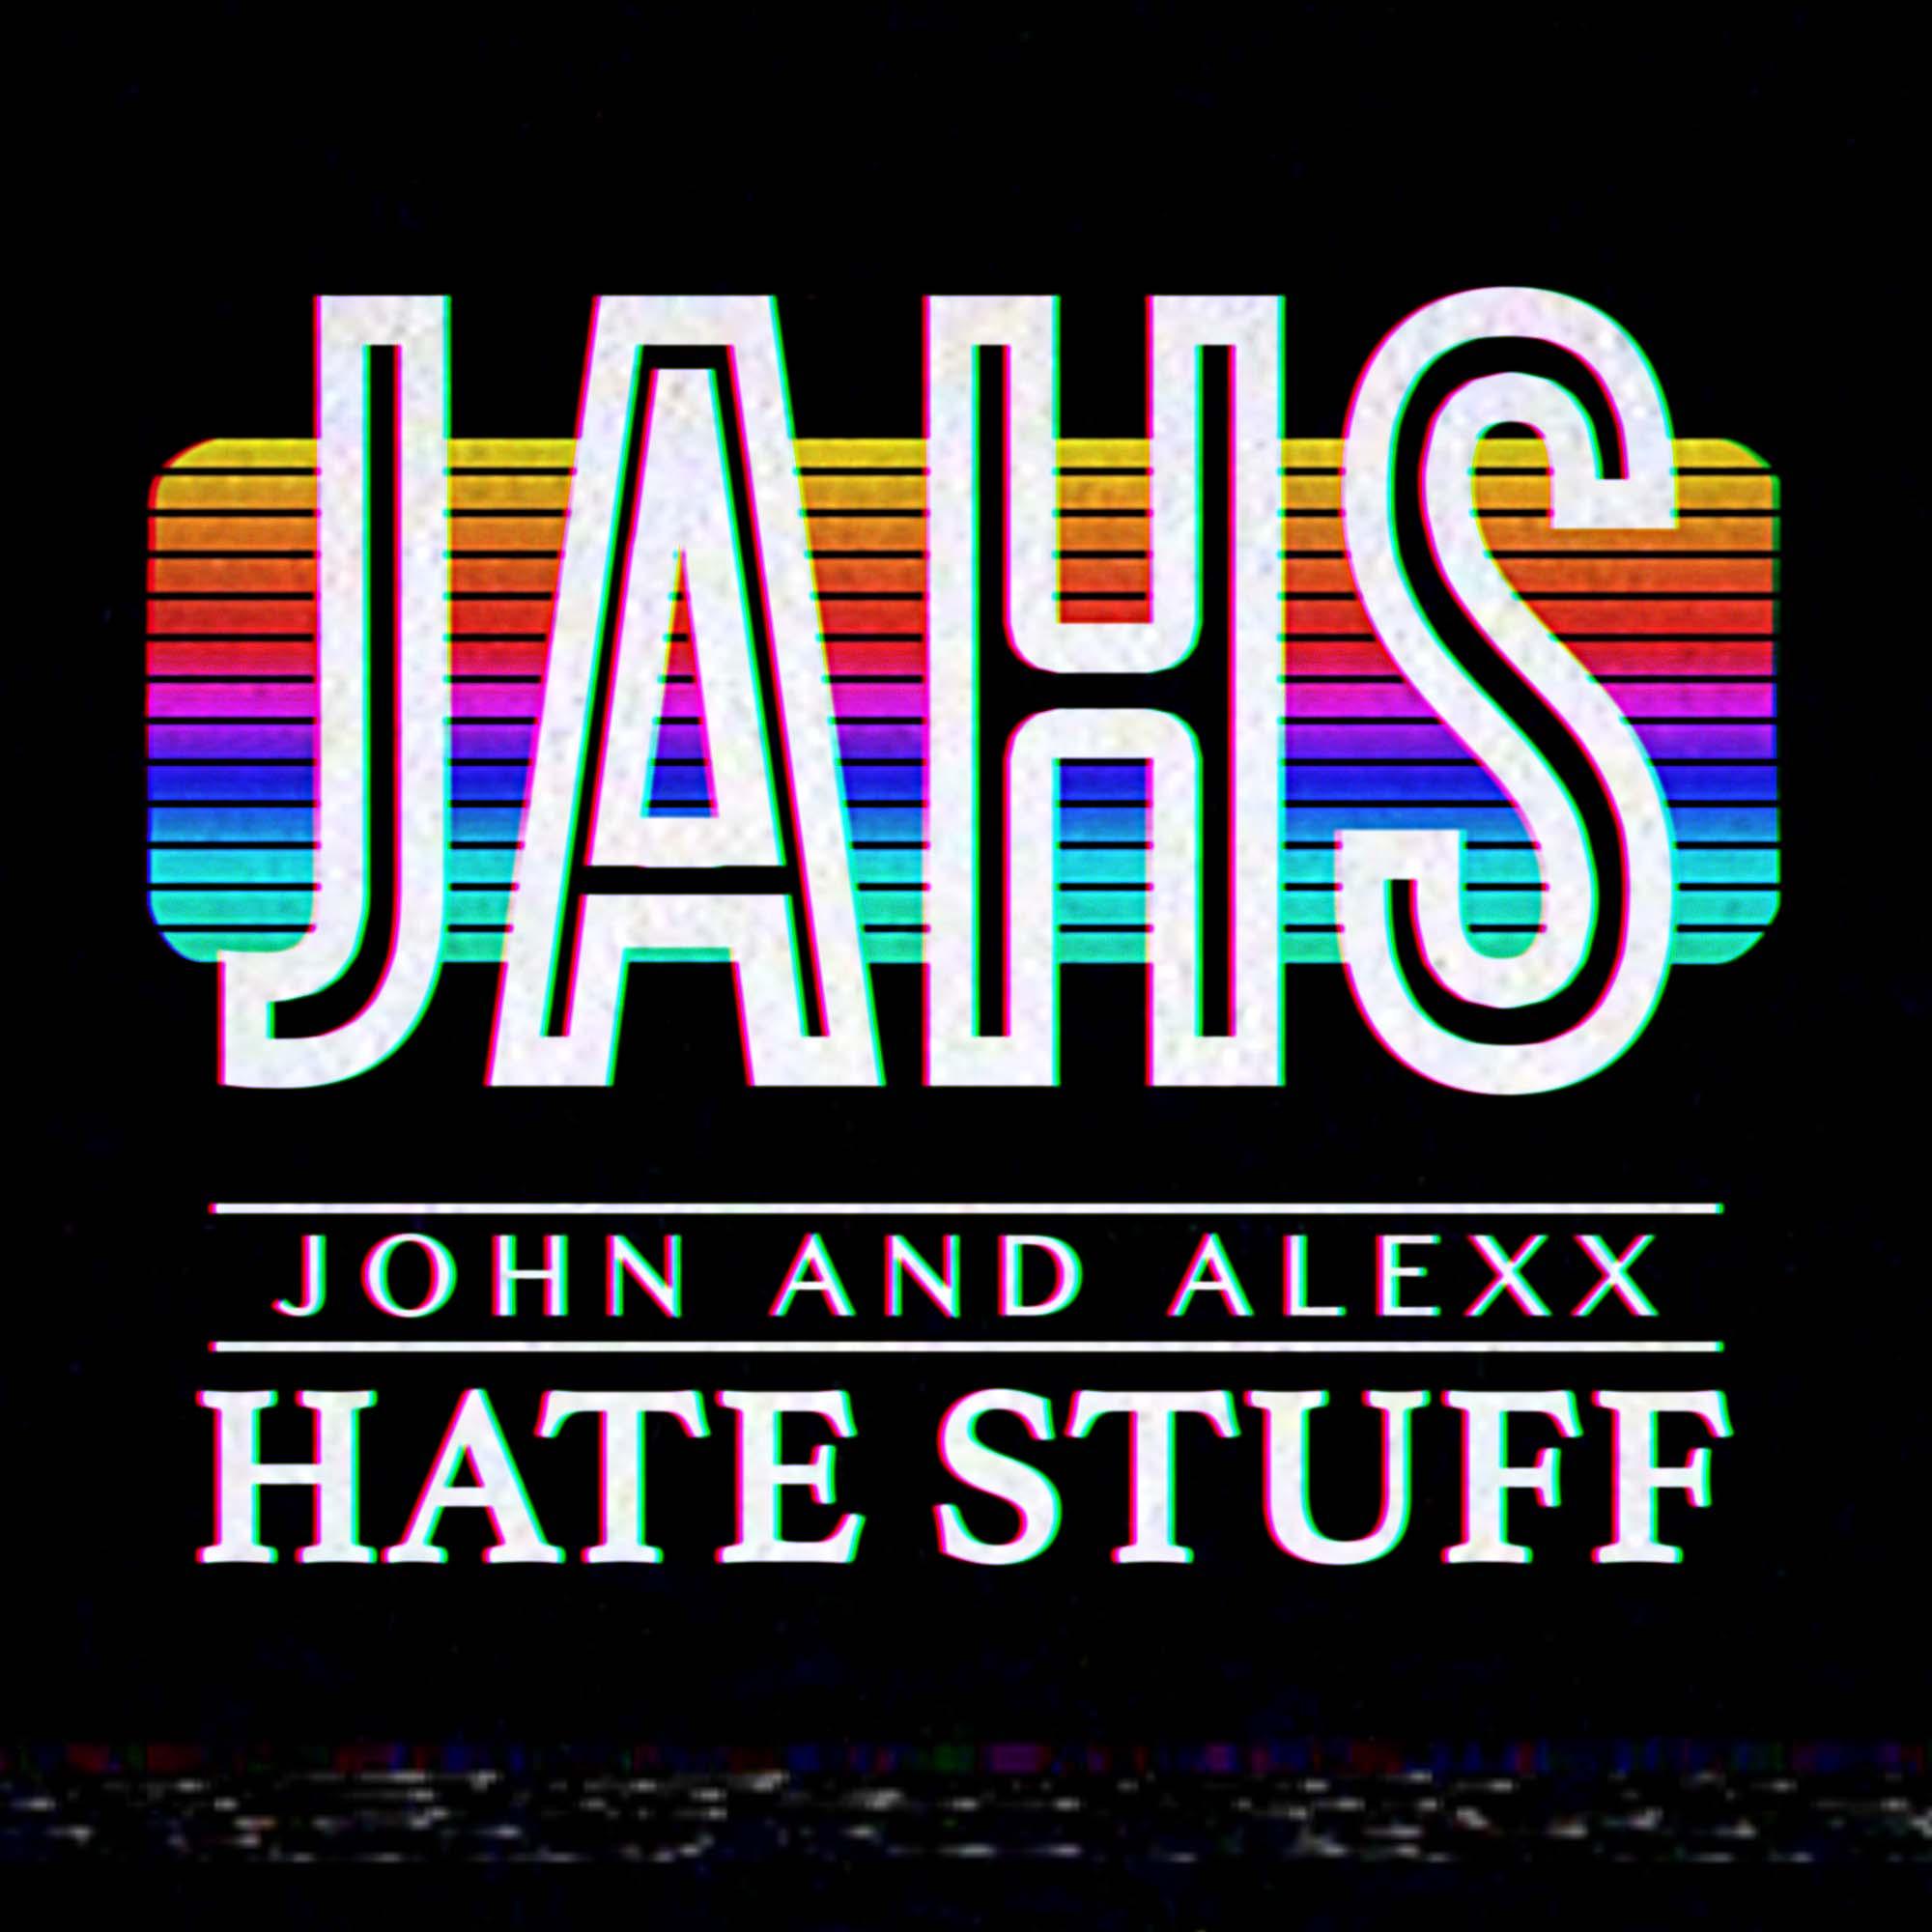 John and Alexx Hate Stuff